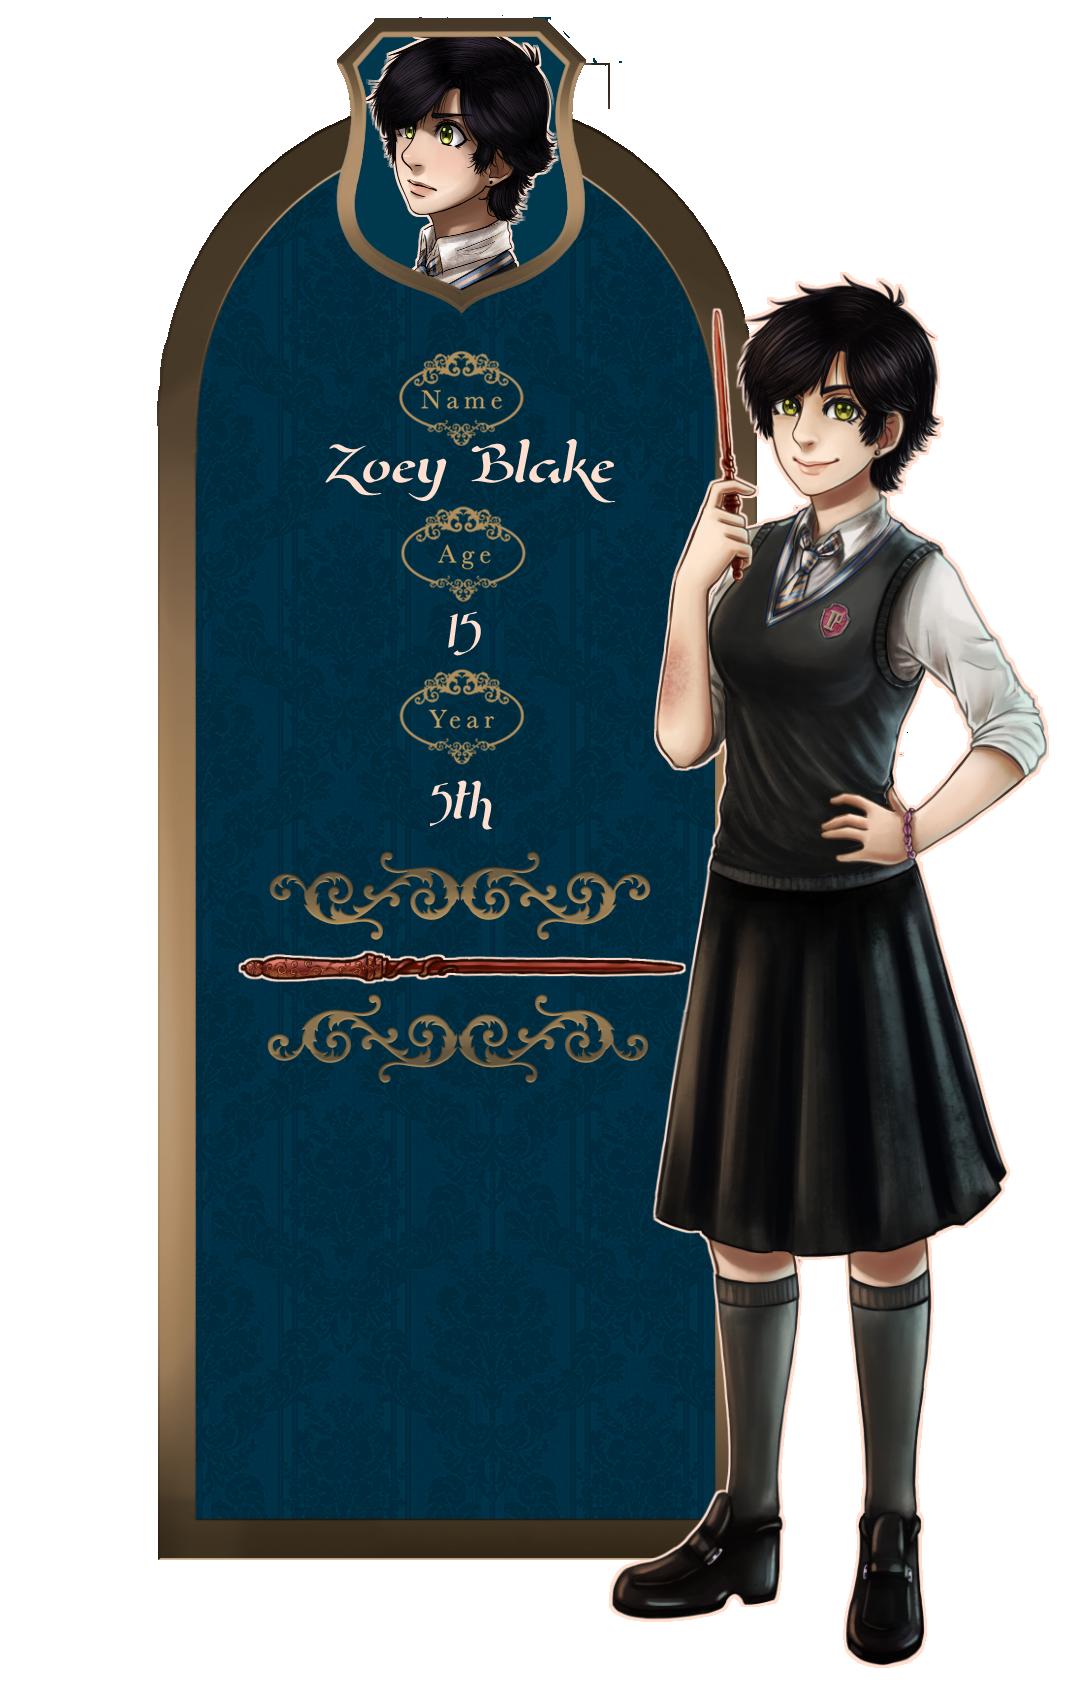 {Illegibilus} Zoey Blake 5th year app by Nikae